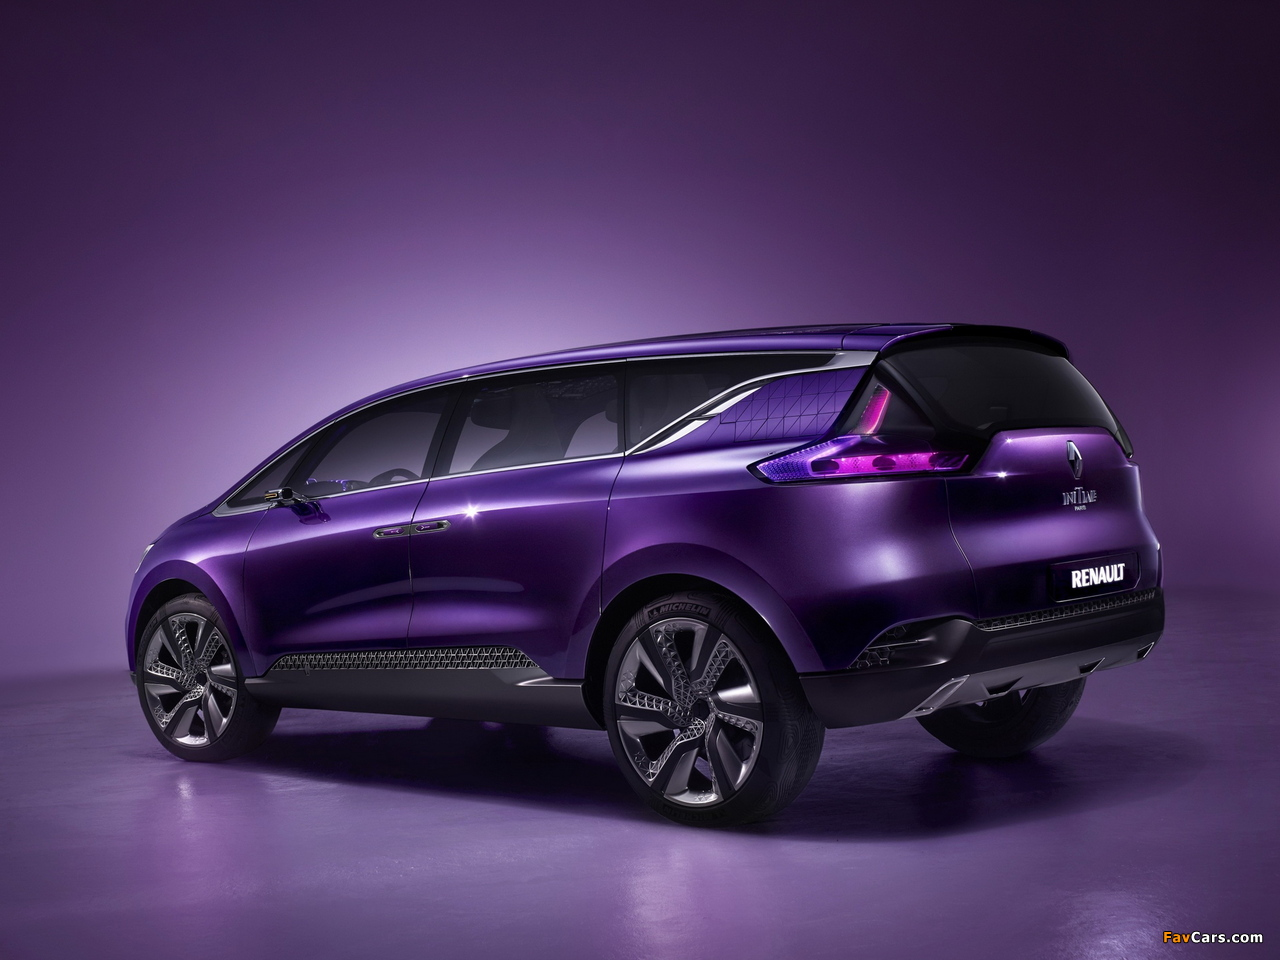 Renault Initiale Paris Concept 2013 pictures (1280 x 960)